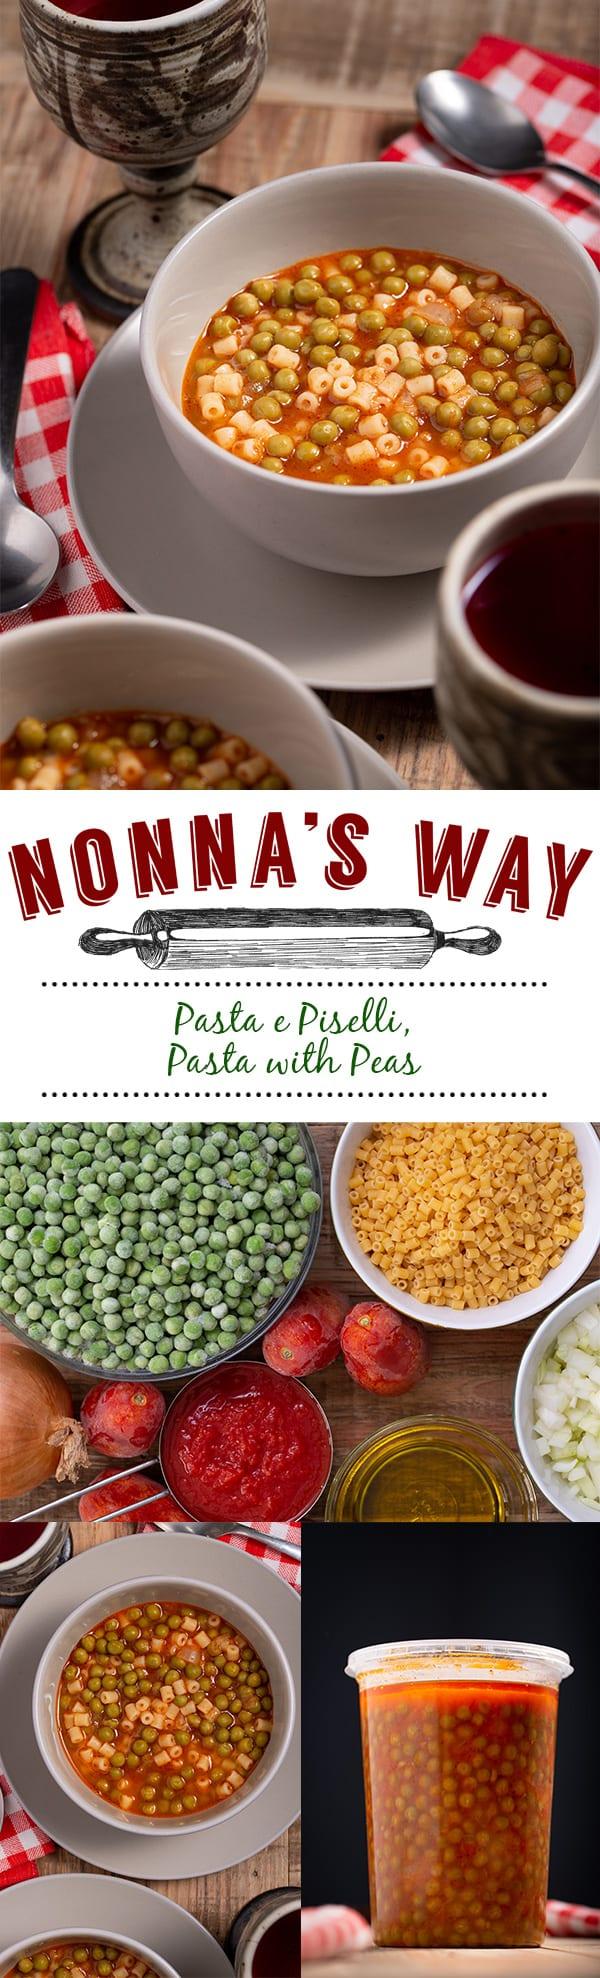 Simple but bursting with flavour - Italian pasta with peas, pasta piselli.